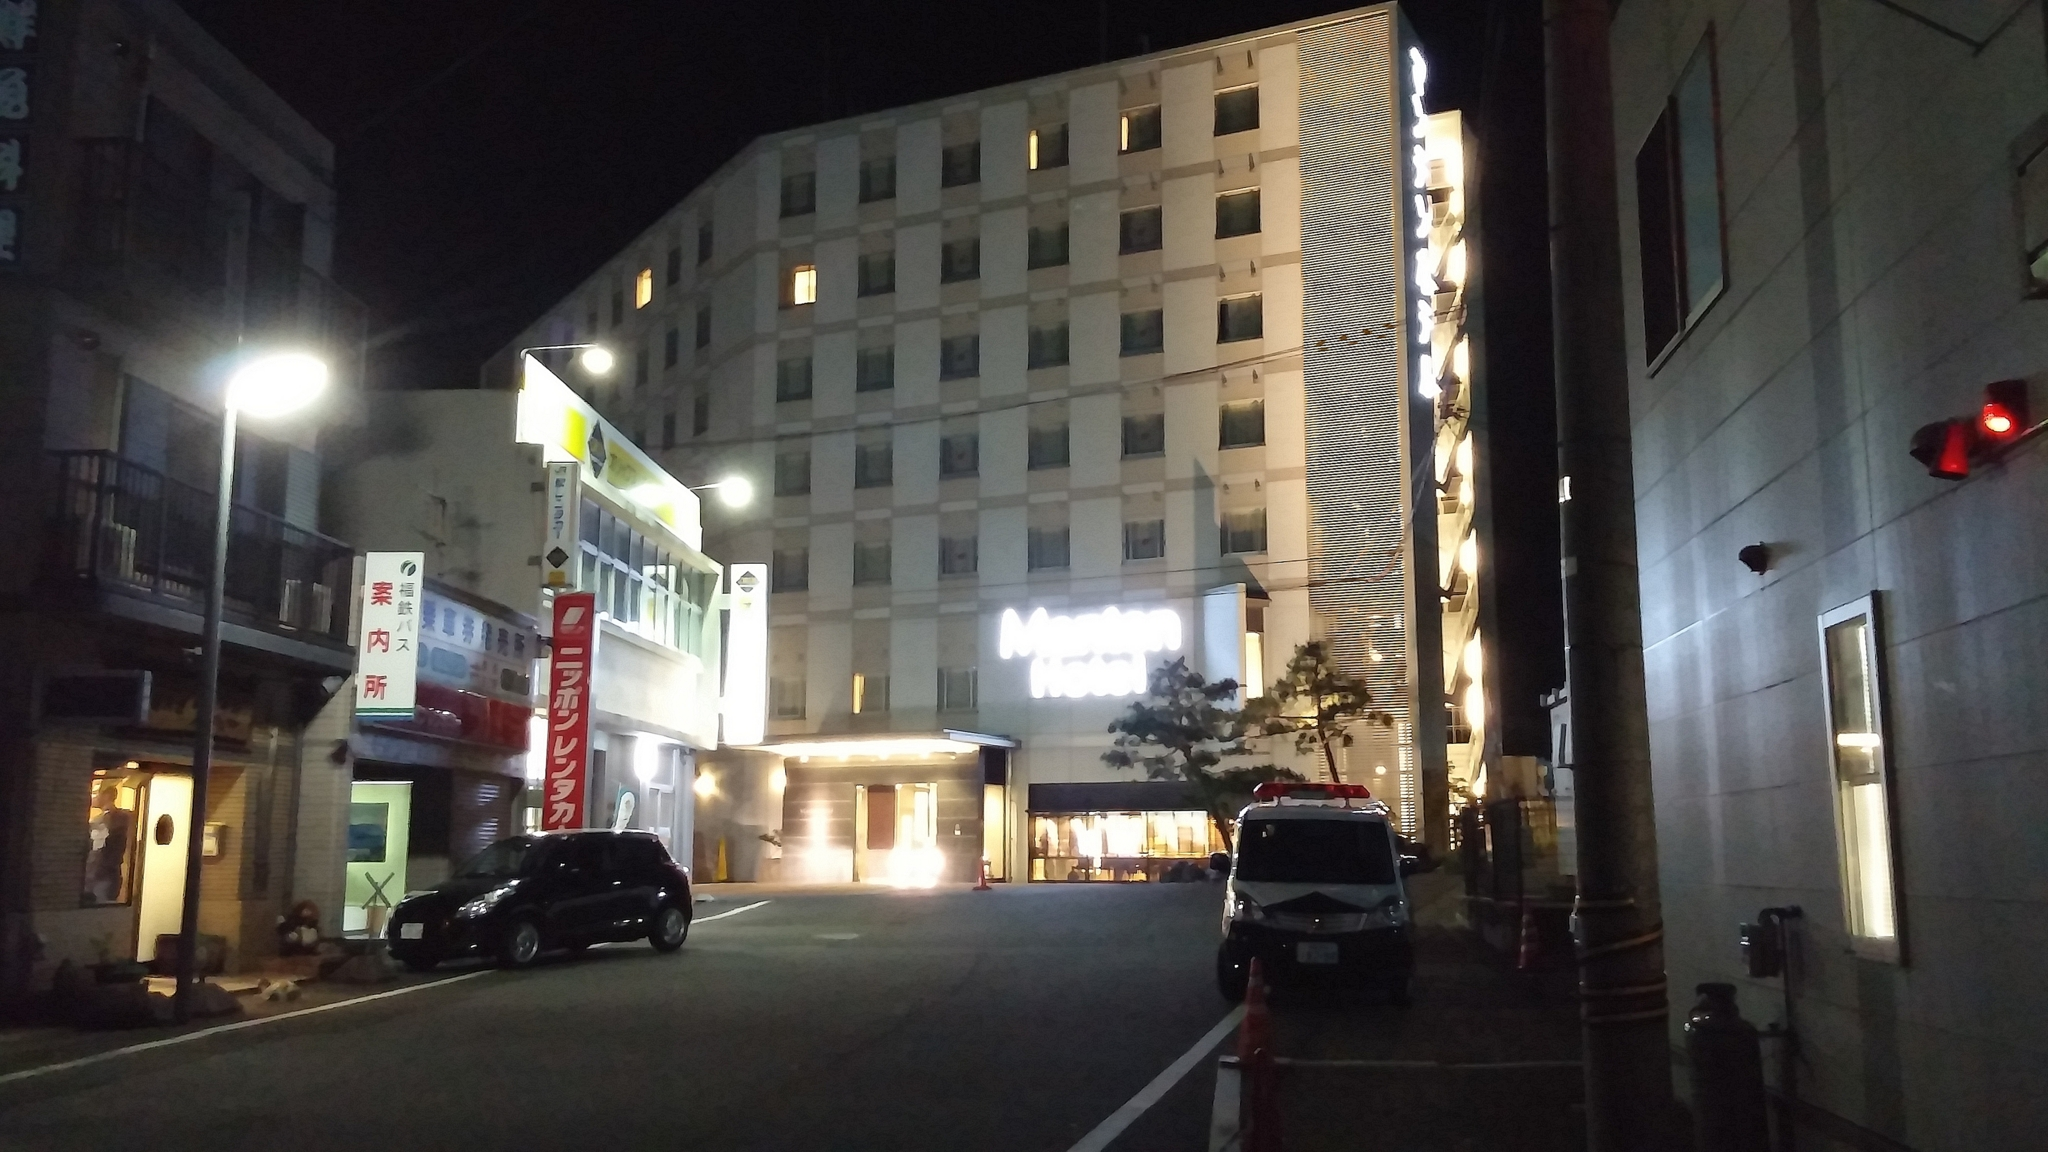 f:id:ToshUeno:20150430201154j:plain